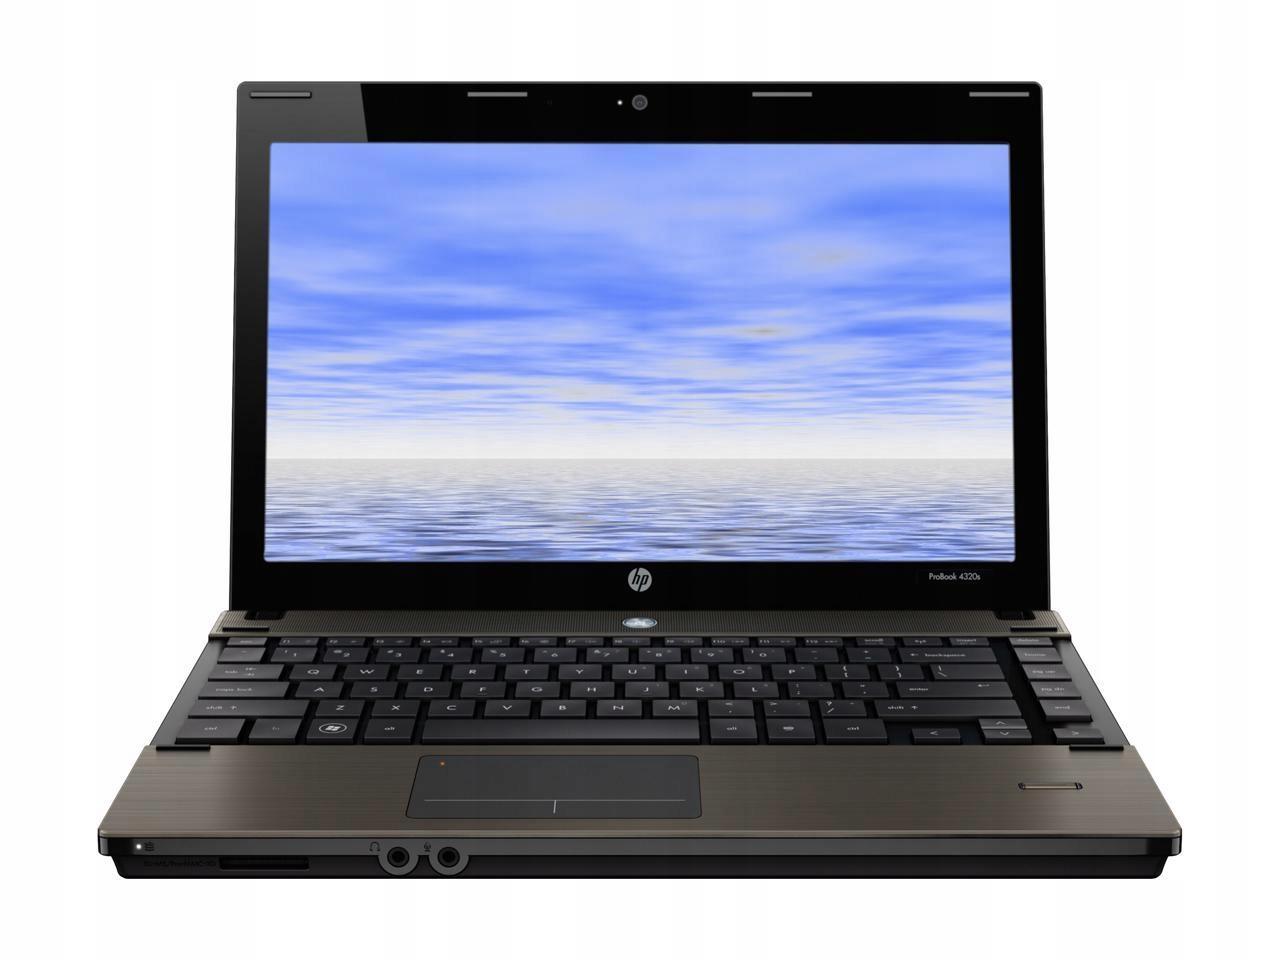 BATERIA AKUMULATOR HP 625 620 ProBook 4320s 4420s 4520S 4720S - Baterie do laptopów